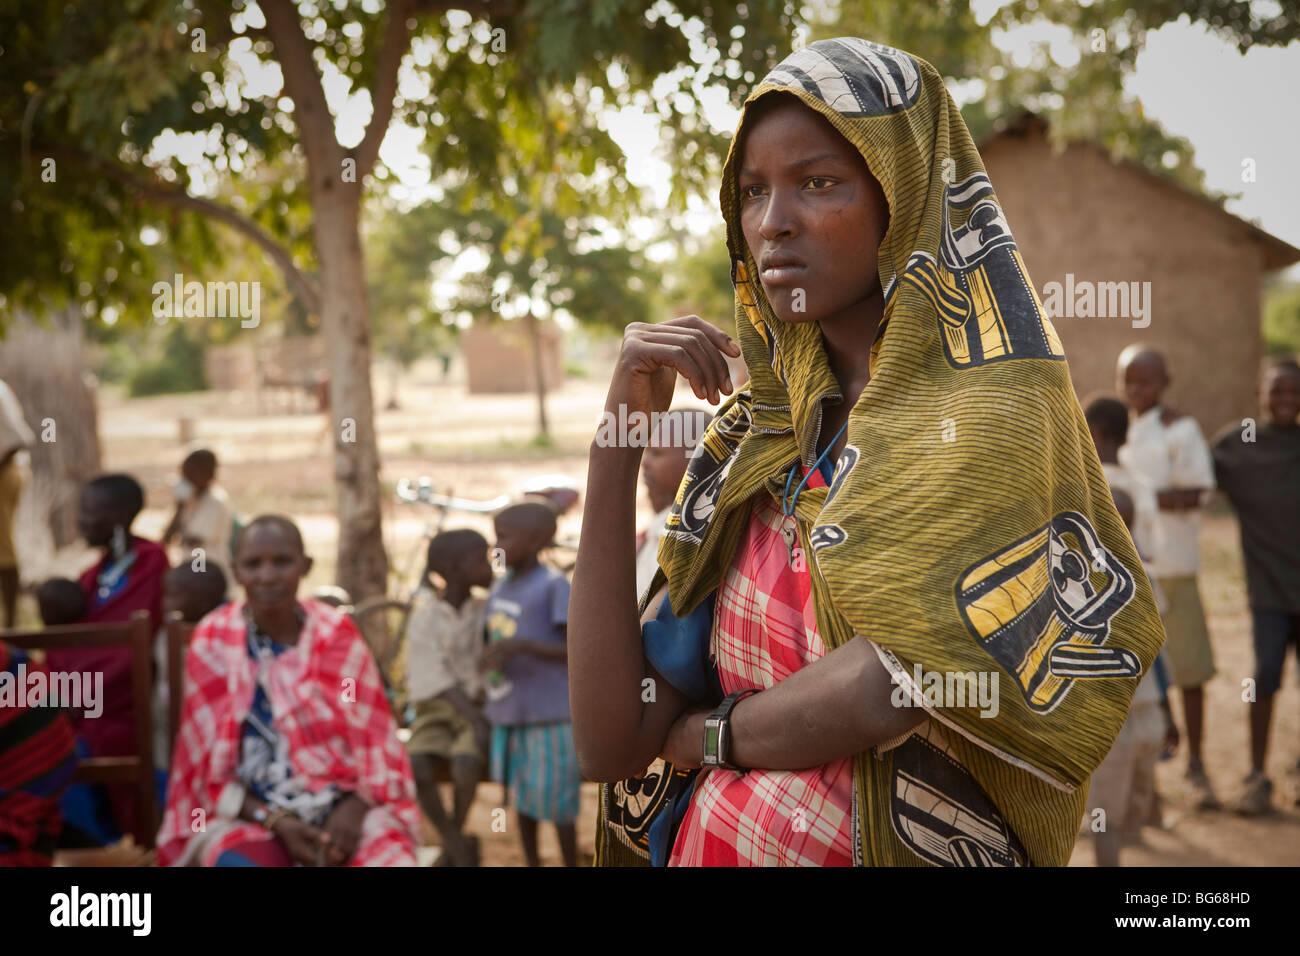 A Maasai woman in traditional dress waits outside a clinic in Kilombero Village, Manyara Region, Tanzania. - Stock Image